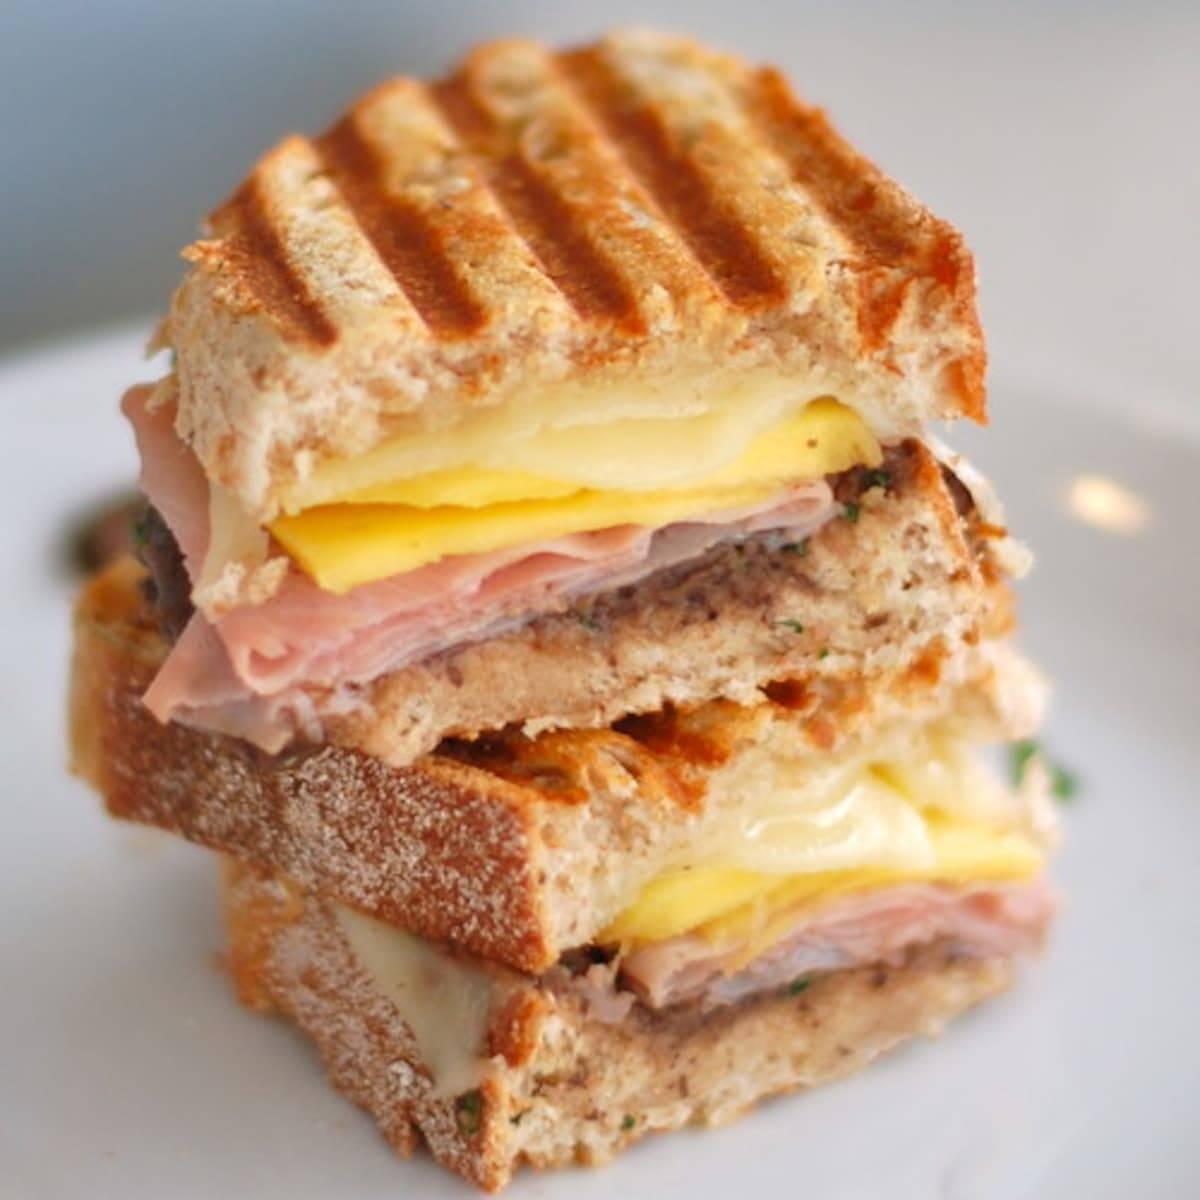 This nuevo cubano sandwich combines black bean cilantro puree, sliced mango, ham, and cheese layered between panini grilled bread. A twist on the Cuban! | pinchofyum.com